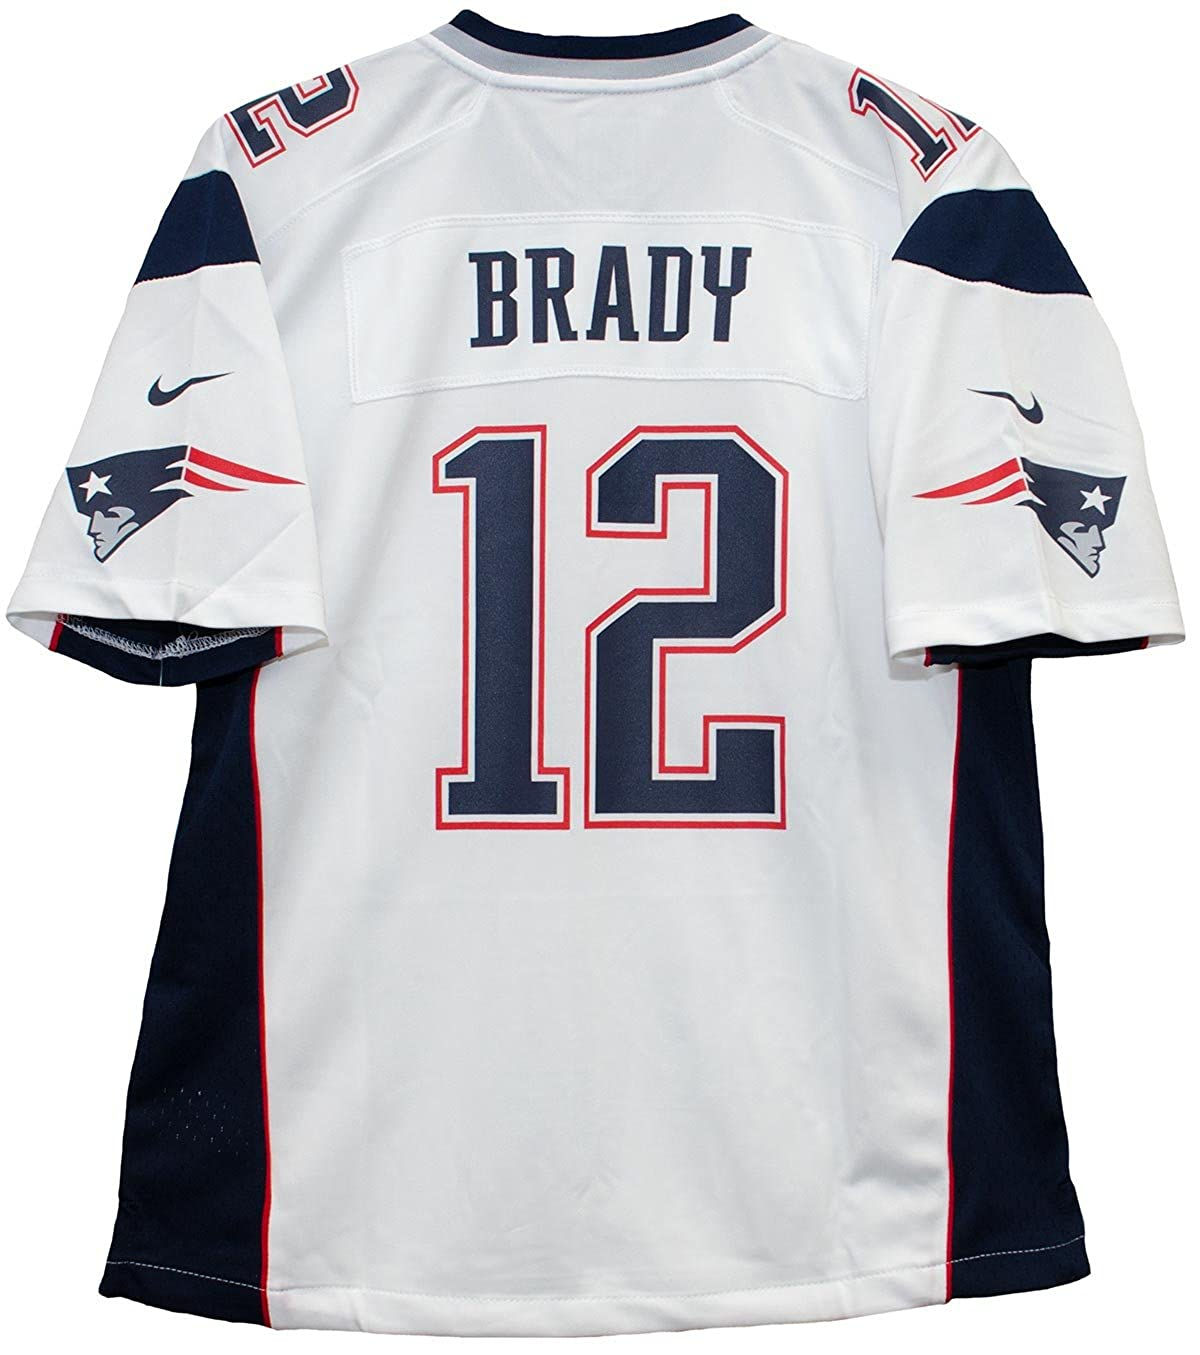 Buy NIKE Tom Brady New England Patriots White Game Youth NFL ...